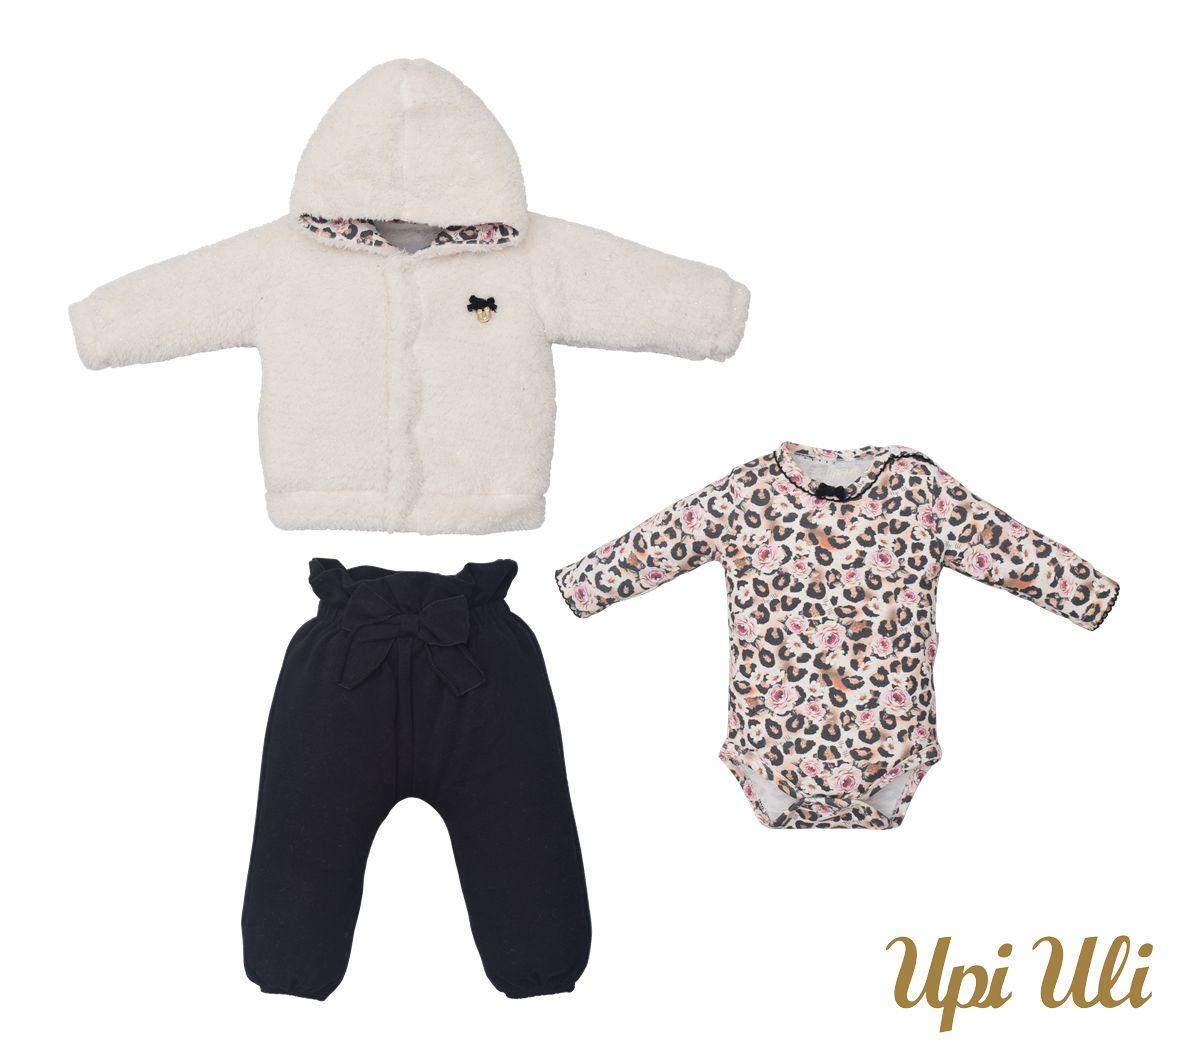 Conjunto de bebê Body C/ Culote  e Casaco Suedine/Pele Islandia Naiara O/I